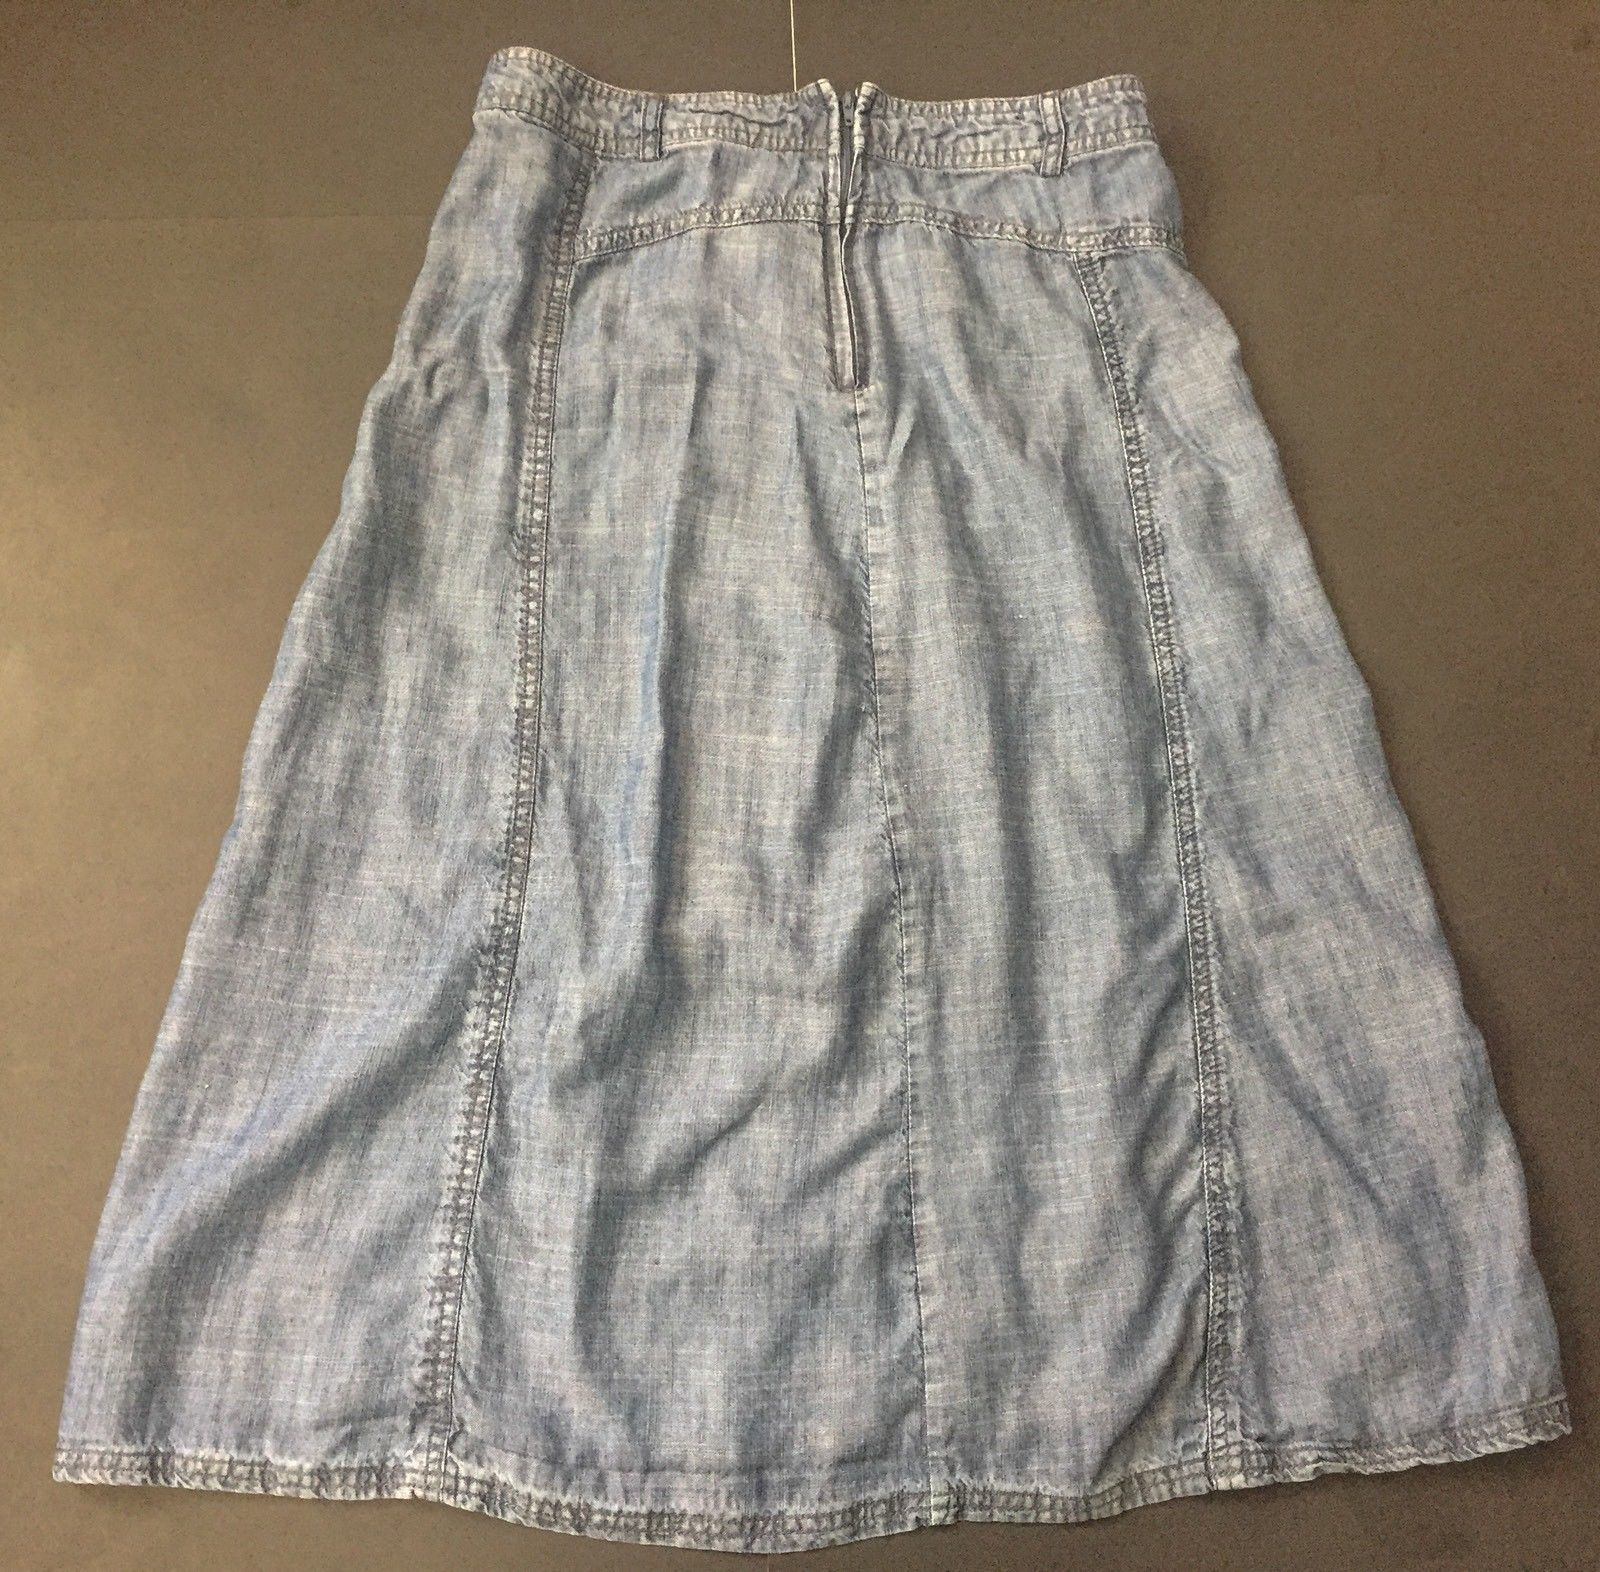 Christopher And Banks Chambray Skirt 6 Linen Blend A-Line Light Blue Modest